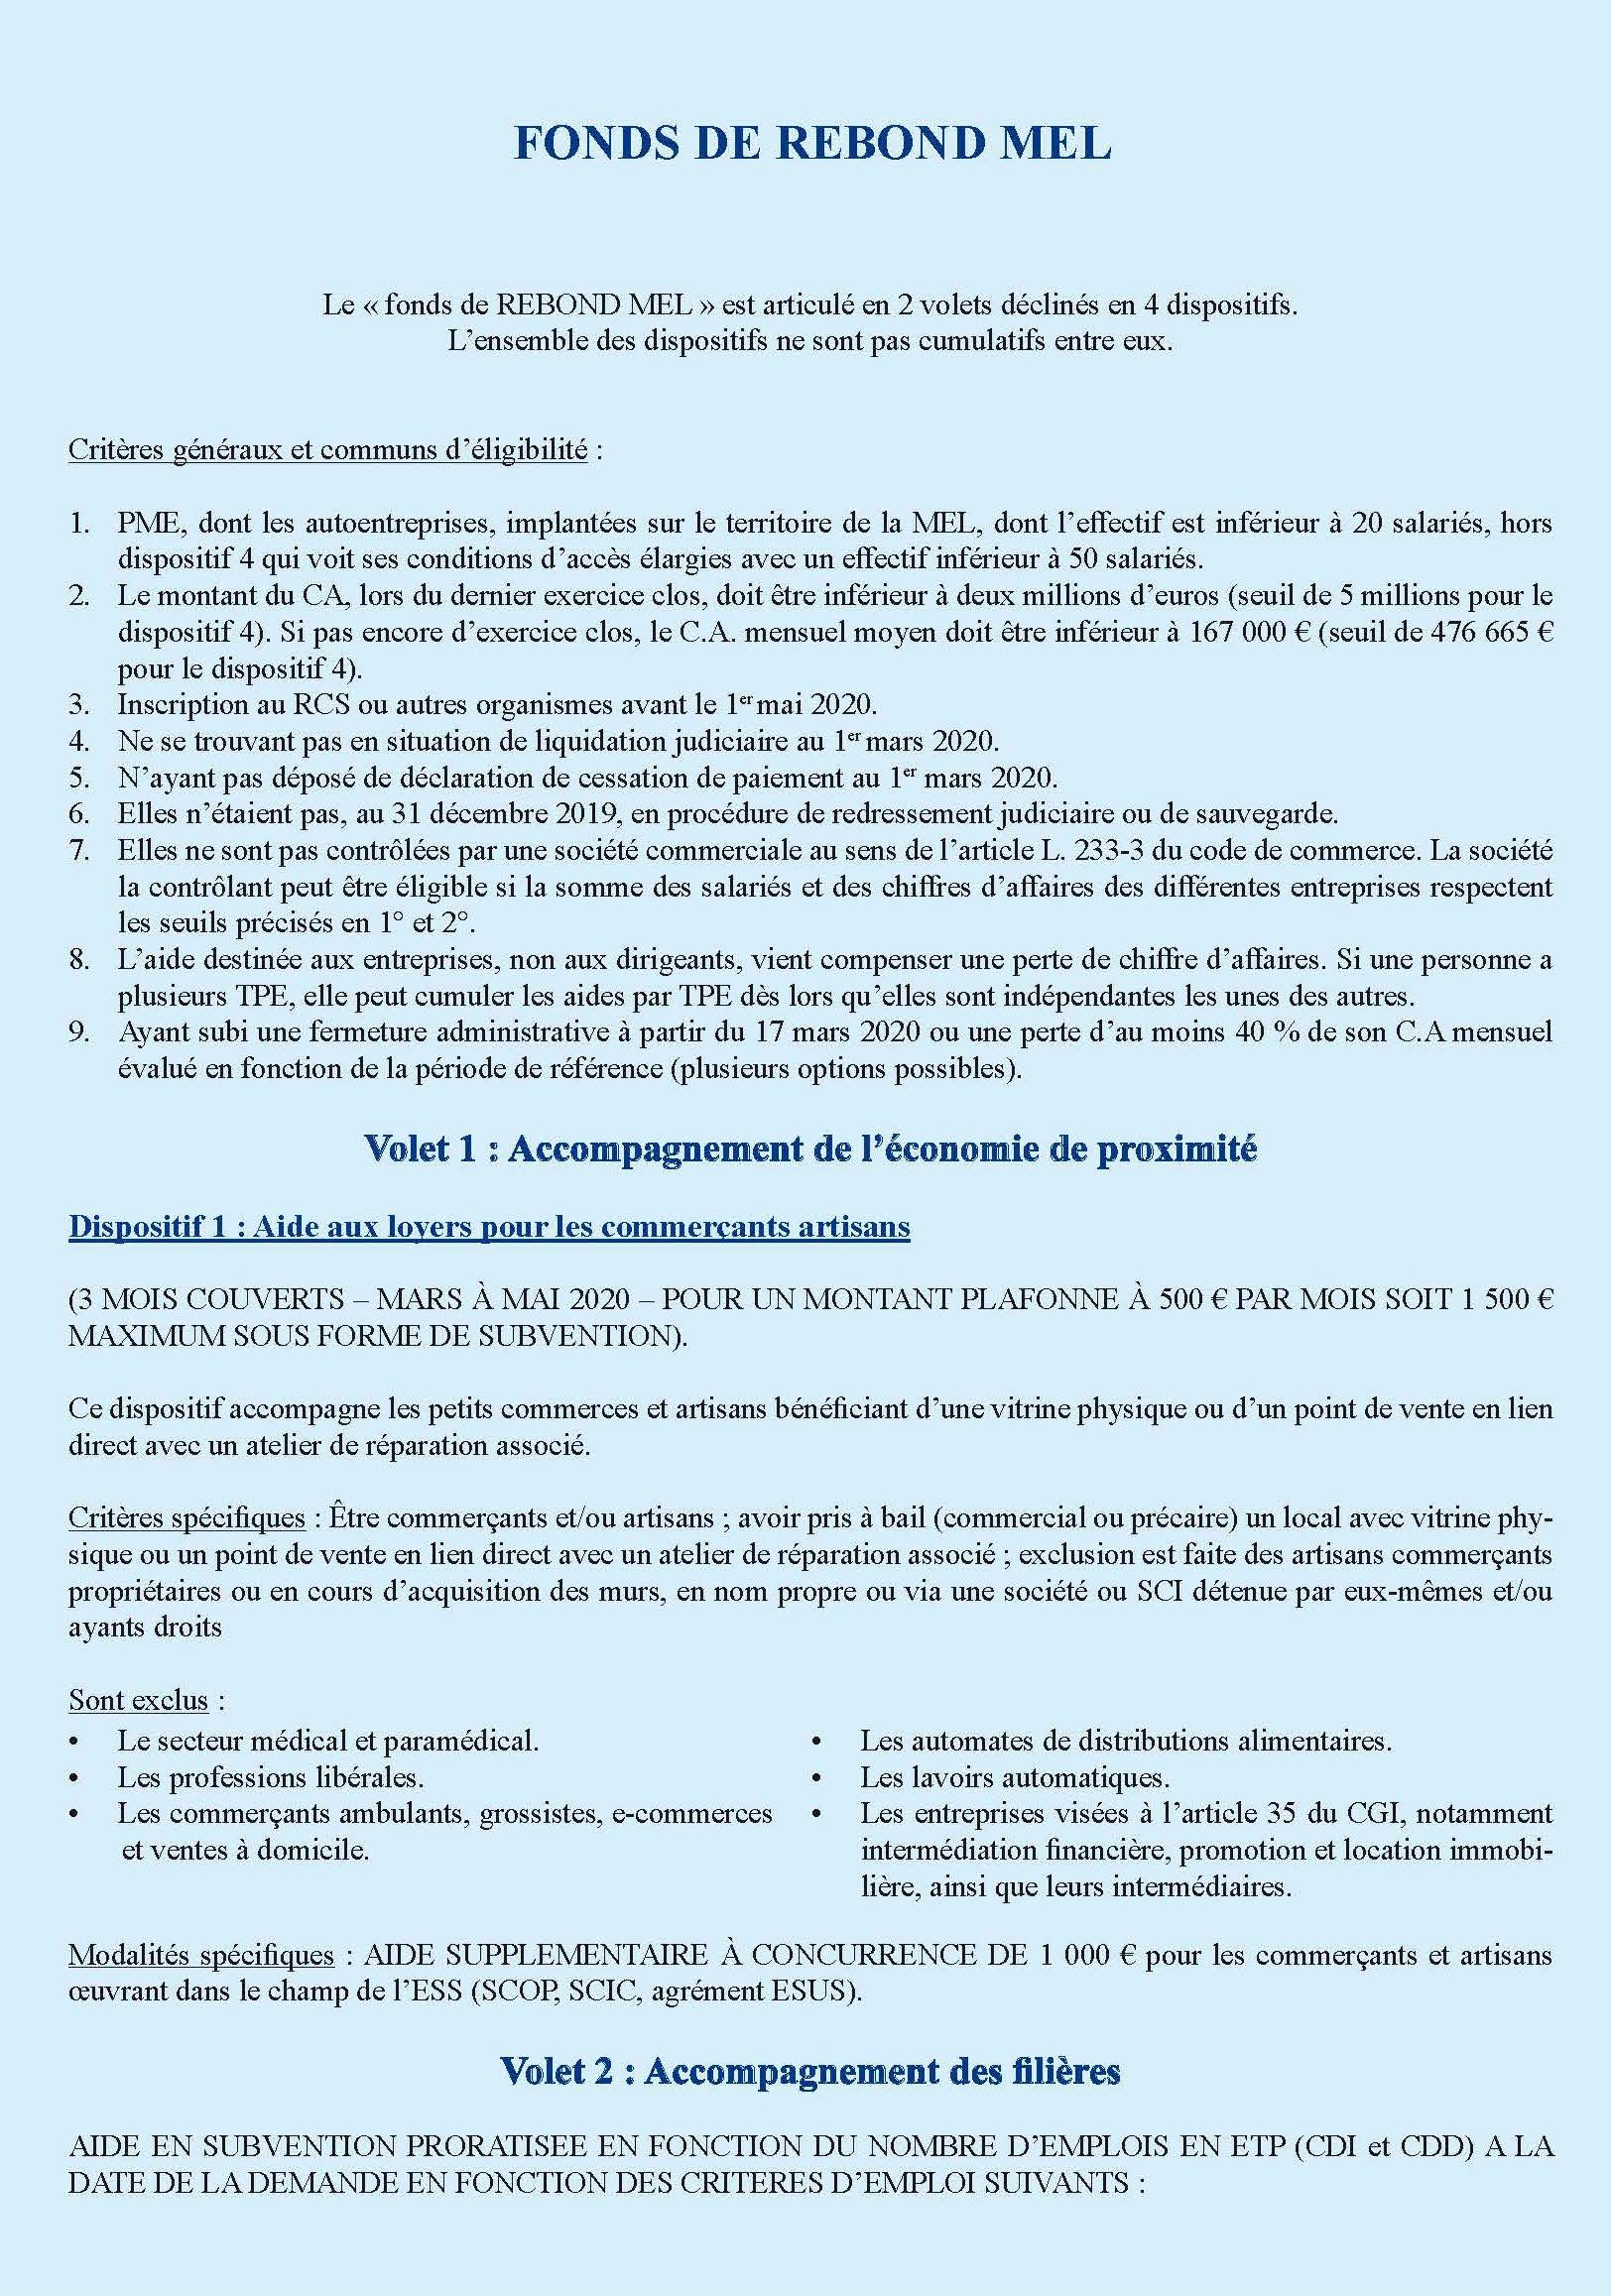 Fonds de rebond MEL, page 1